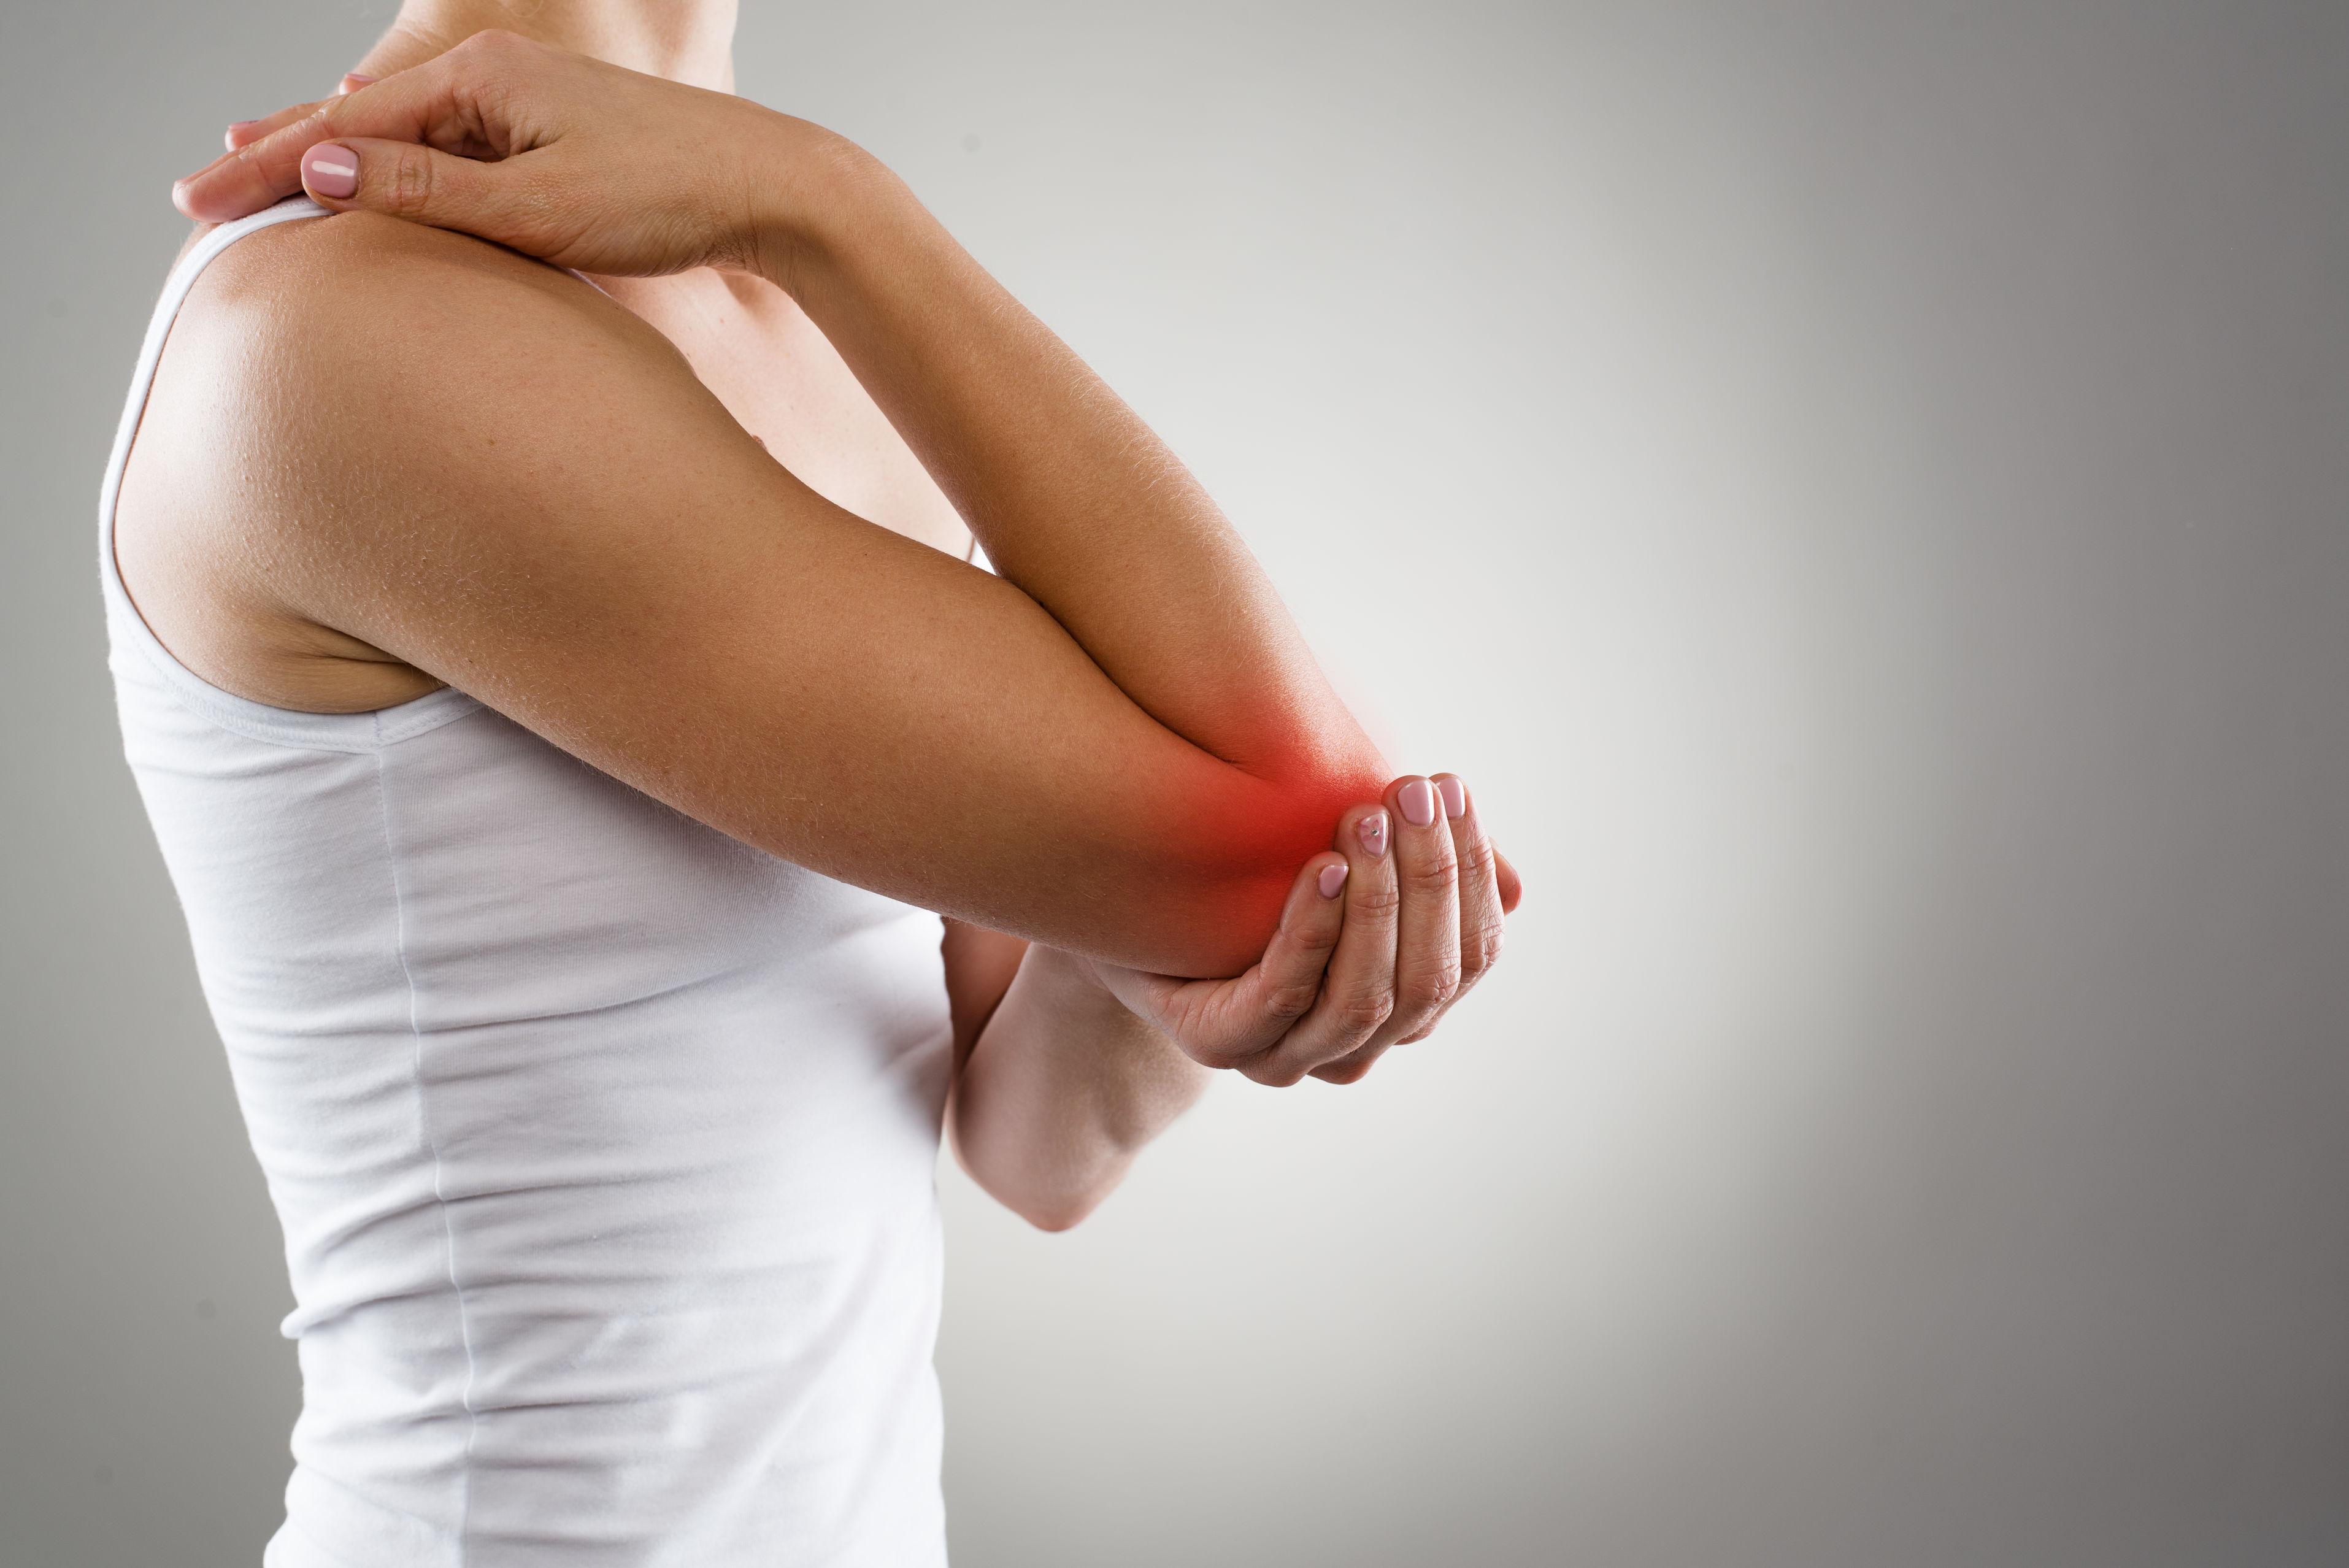 Reumatológia, Reumatológiai szakrendelés, Reumatológus - Medicover